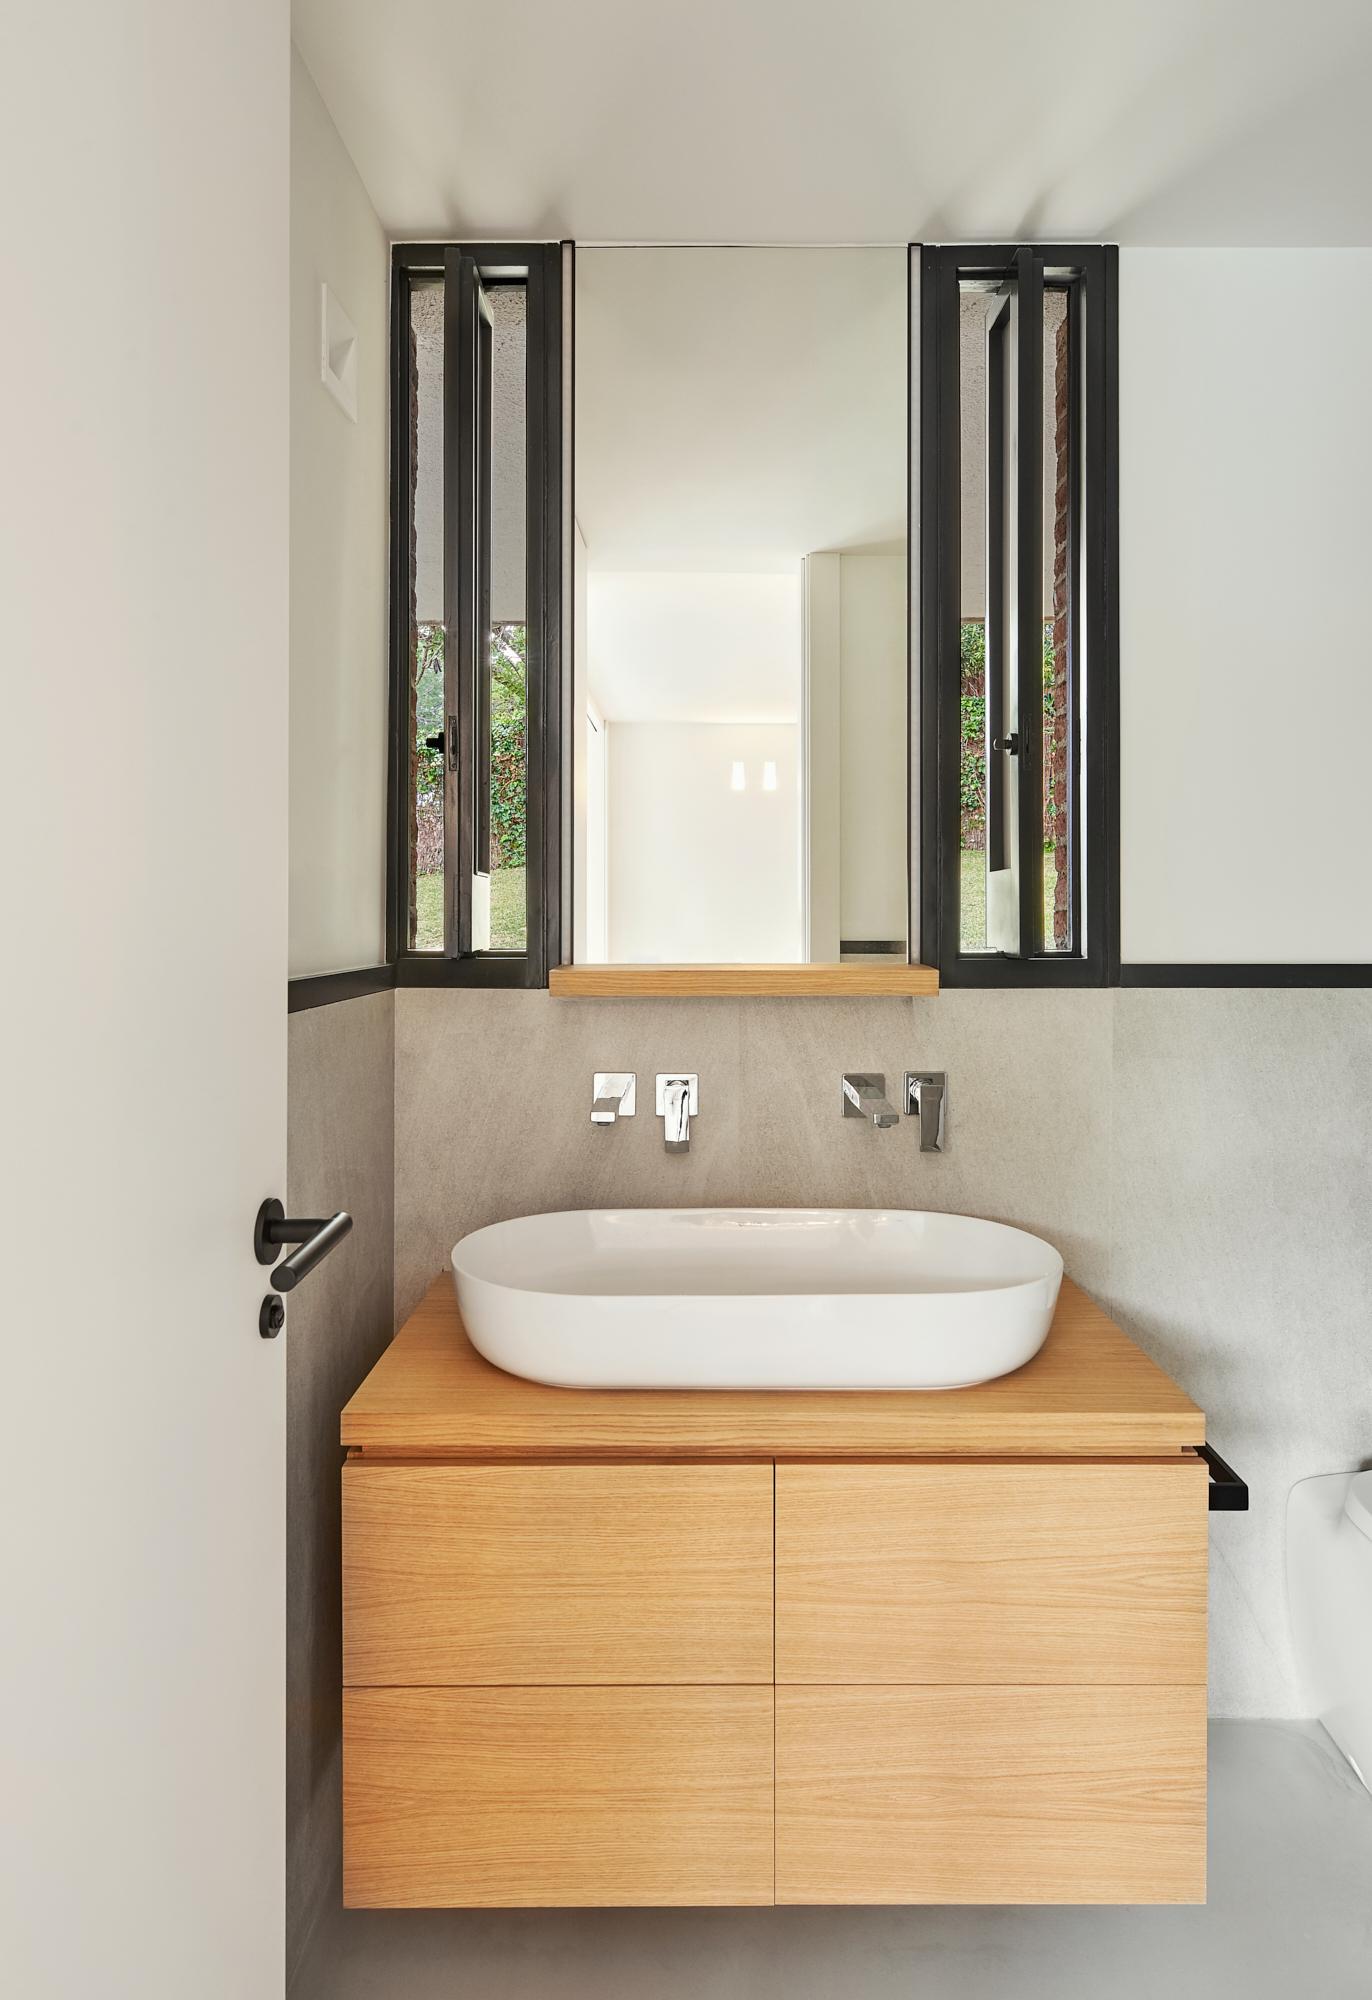 arquitectos en barcelona sitges full refurbishment single storie house in valpineda I